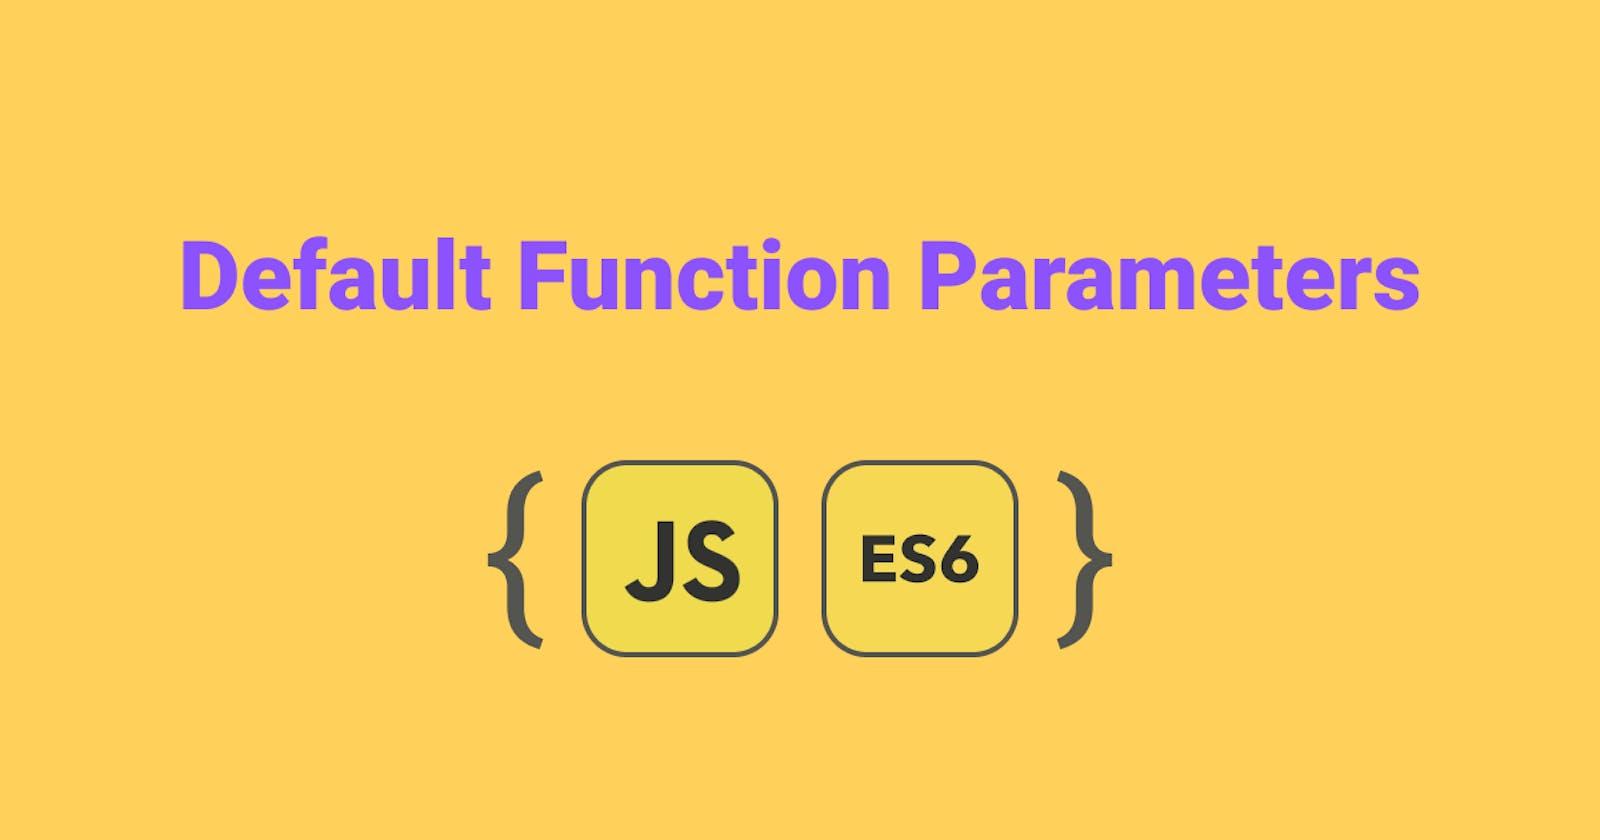 Default Function Parameters